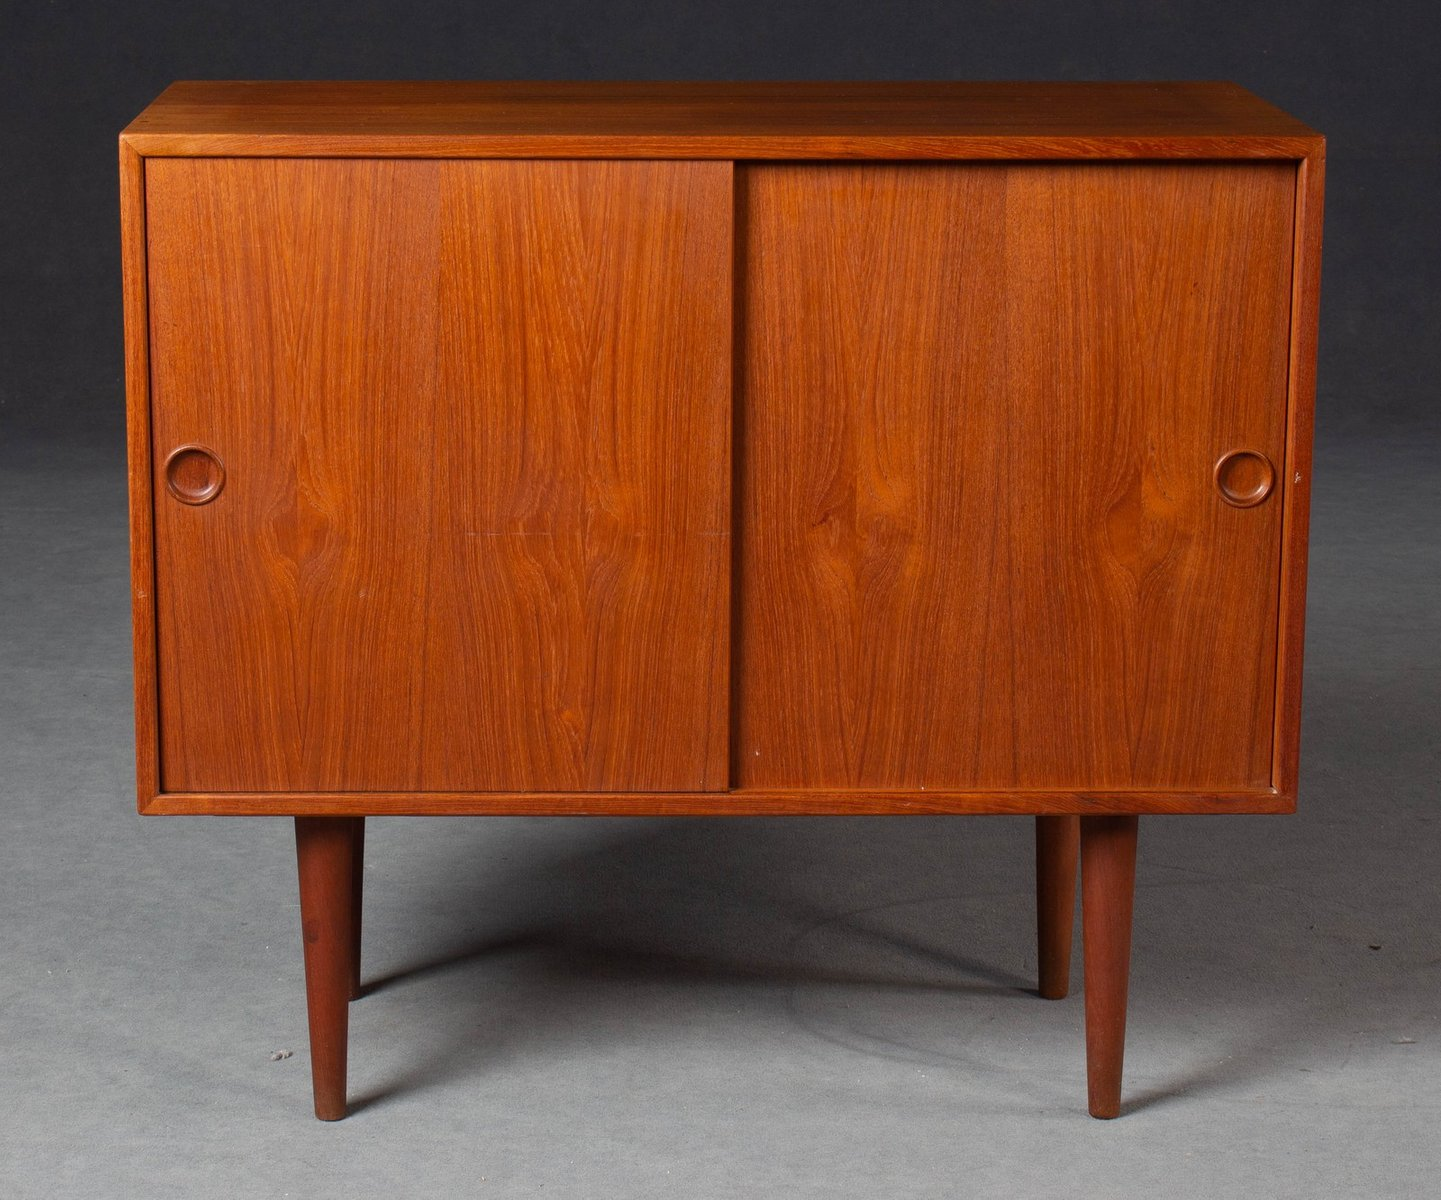 Vintage Danish Sideboard for sale at Pamono